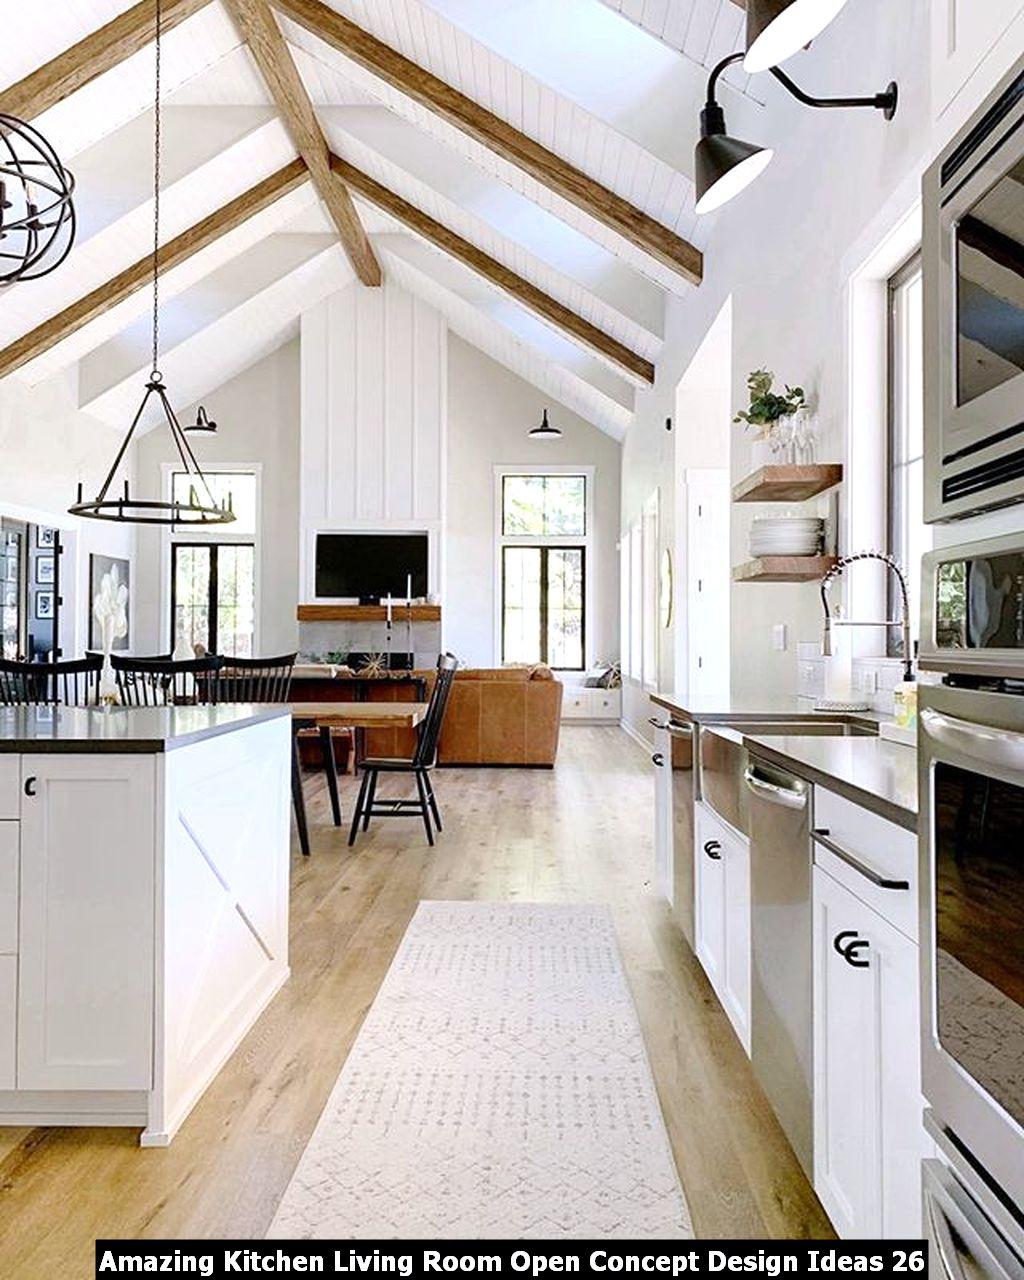 Amazing Kitchen Living Room Open Concept Design Ideas 26